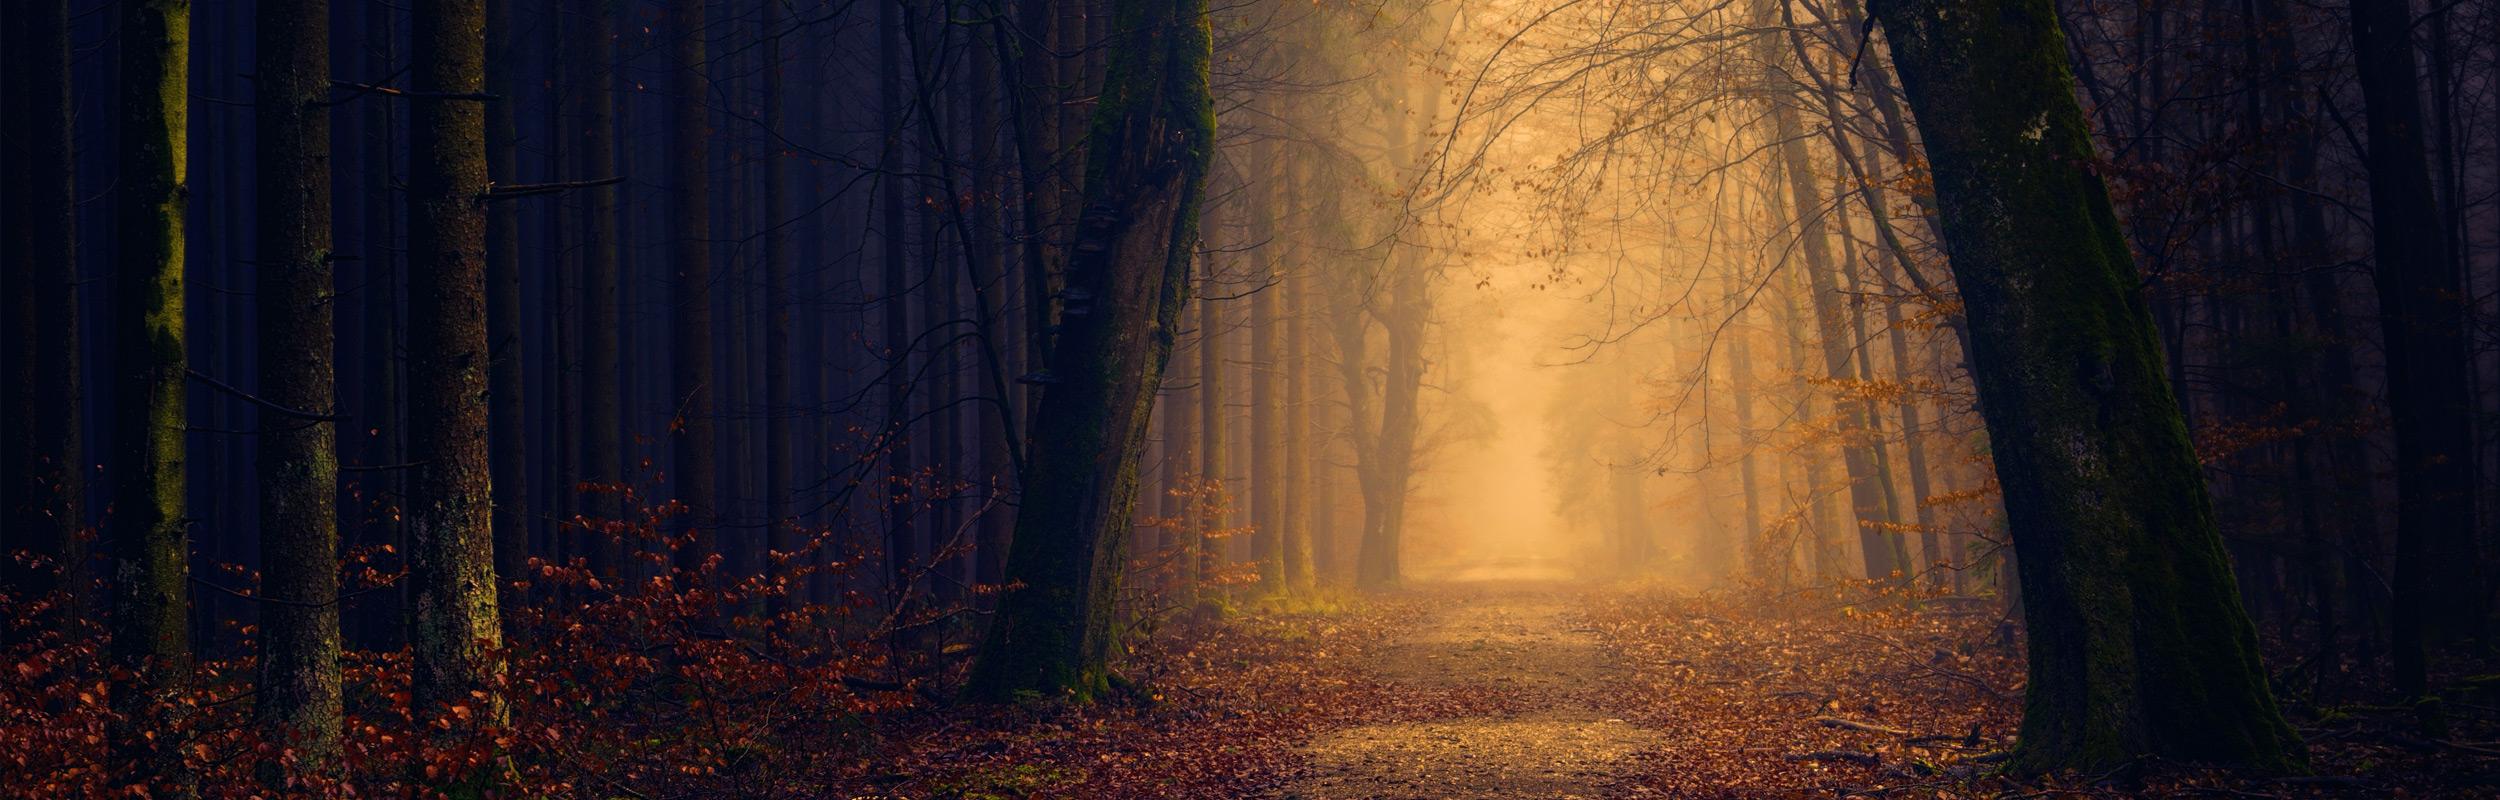 four-seasons-image.jpg